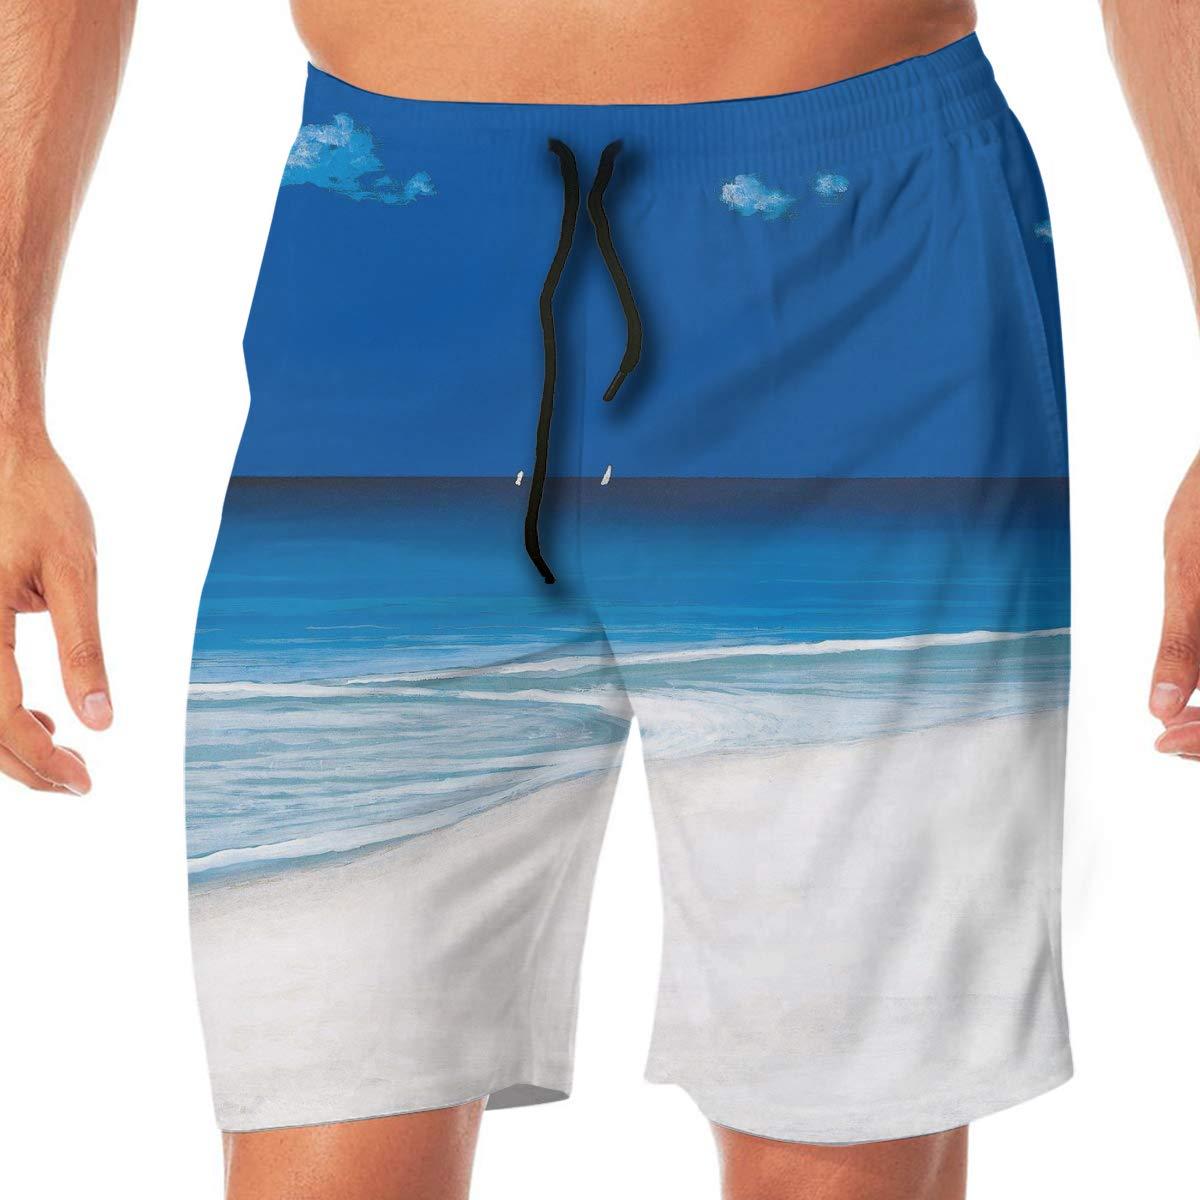 Mens Swim Trunks Quick Dry Ocean Nautical Tropical Island Beach Beach Board Shorts Bathing Suits with Pockets